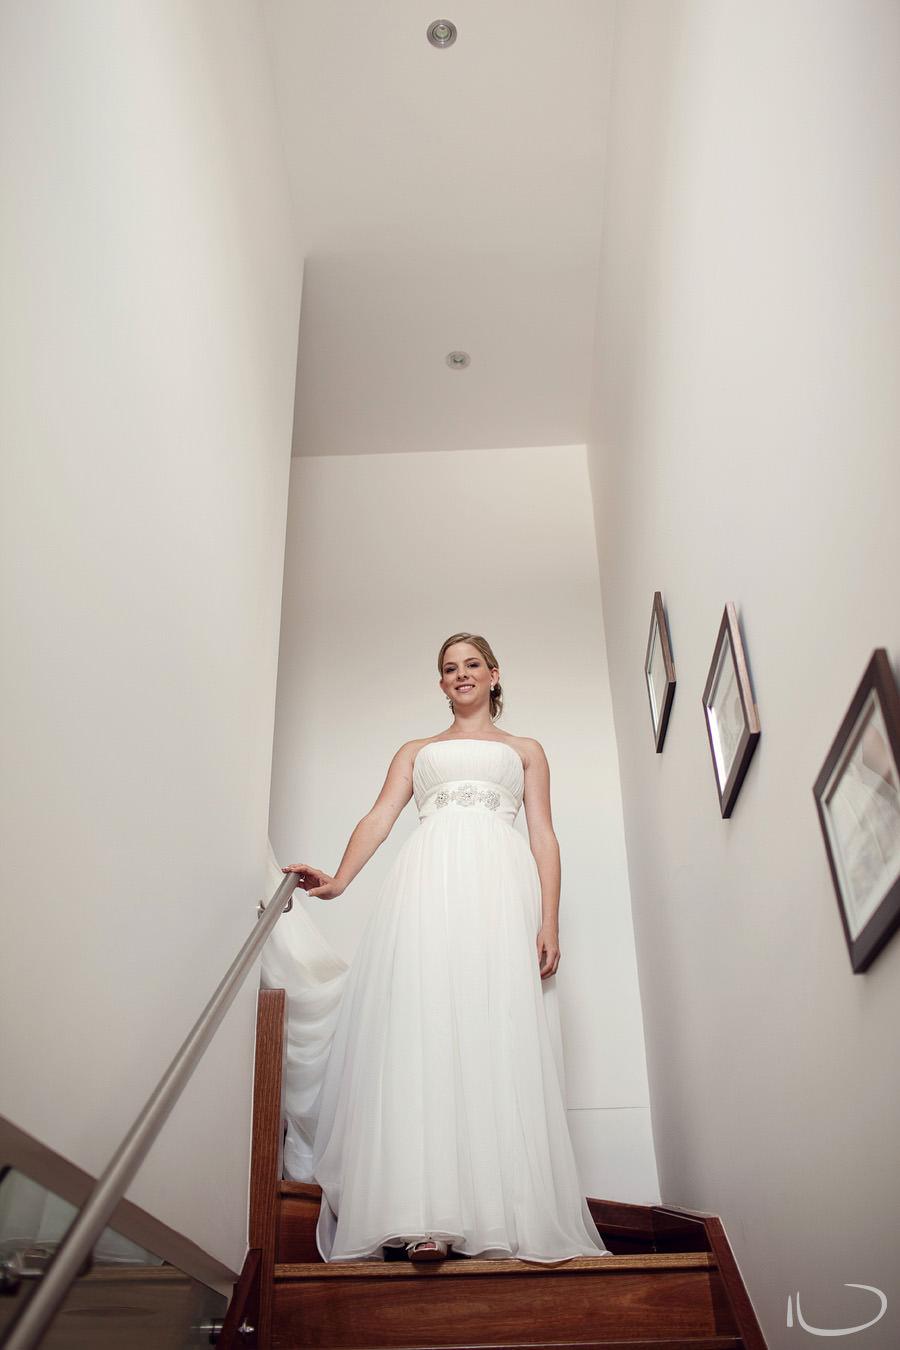 Cronulla Wedding Photographer: Bride ready